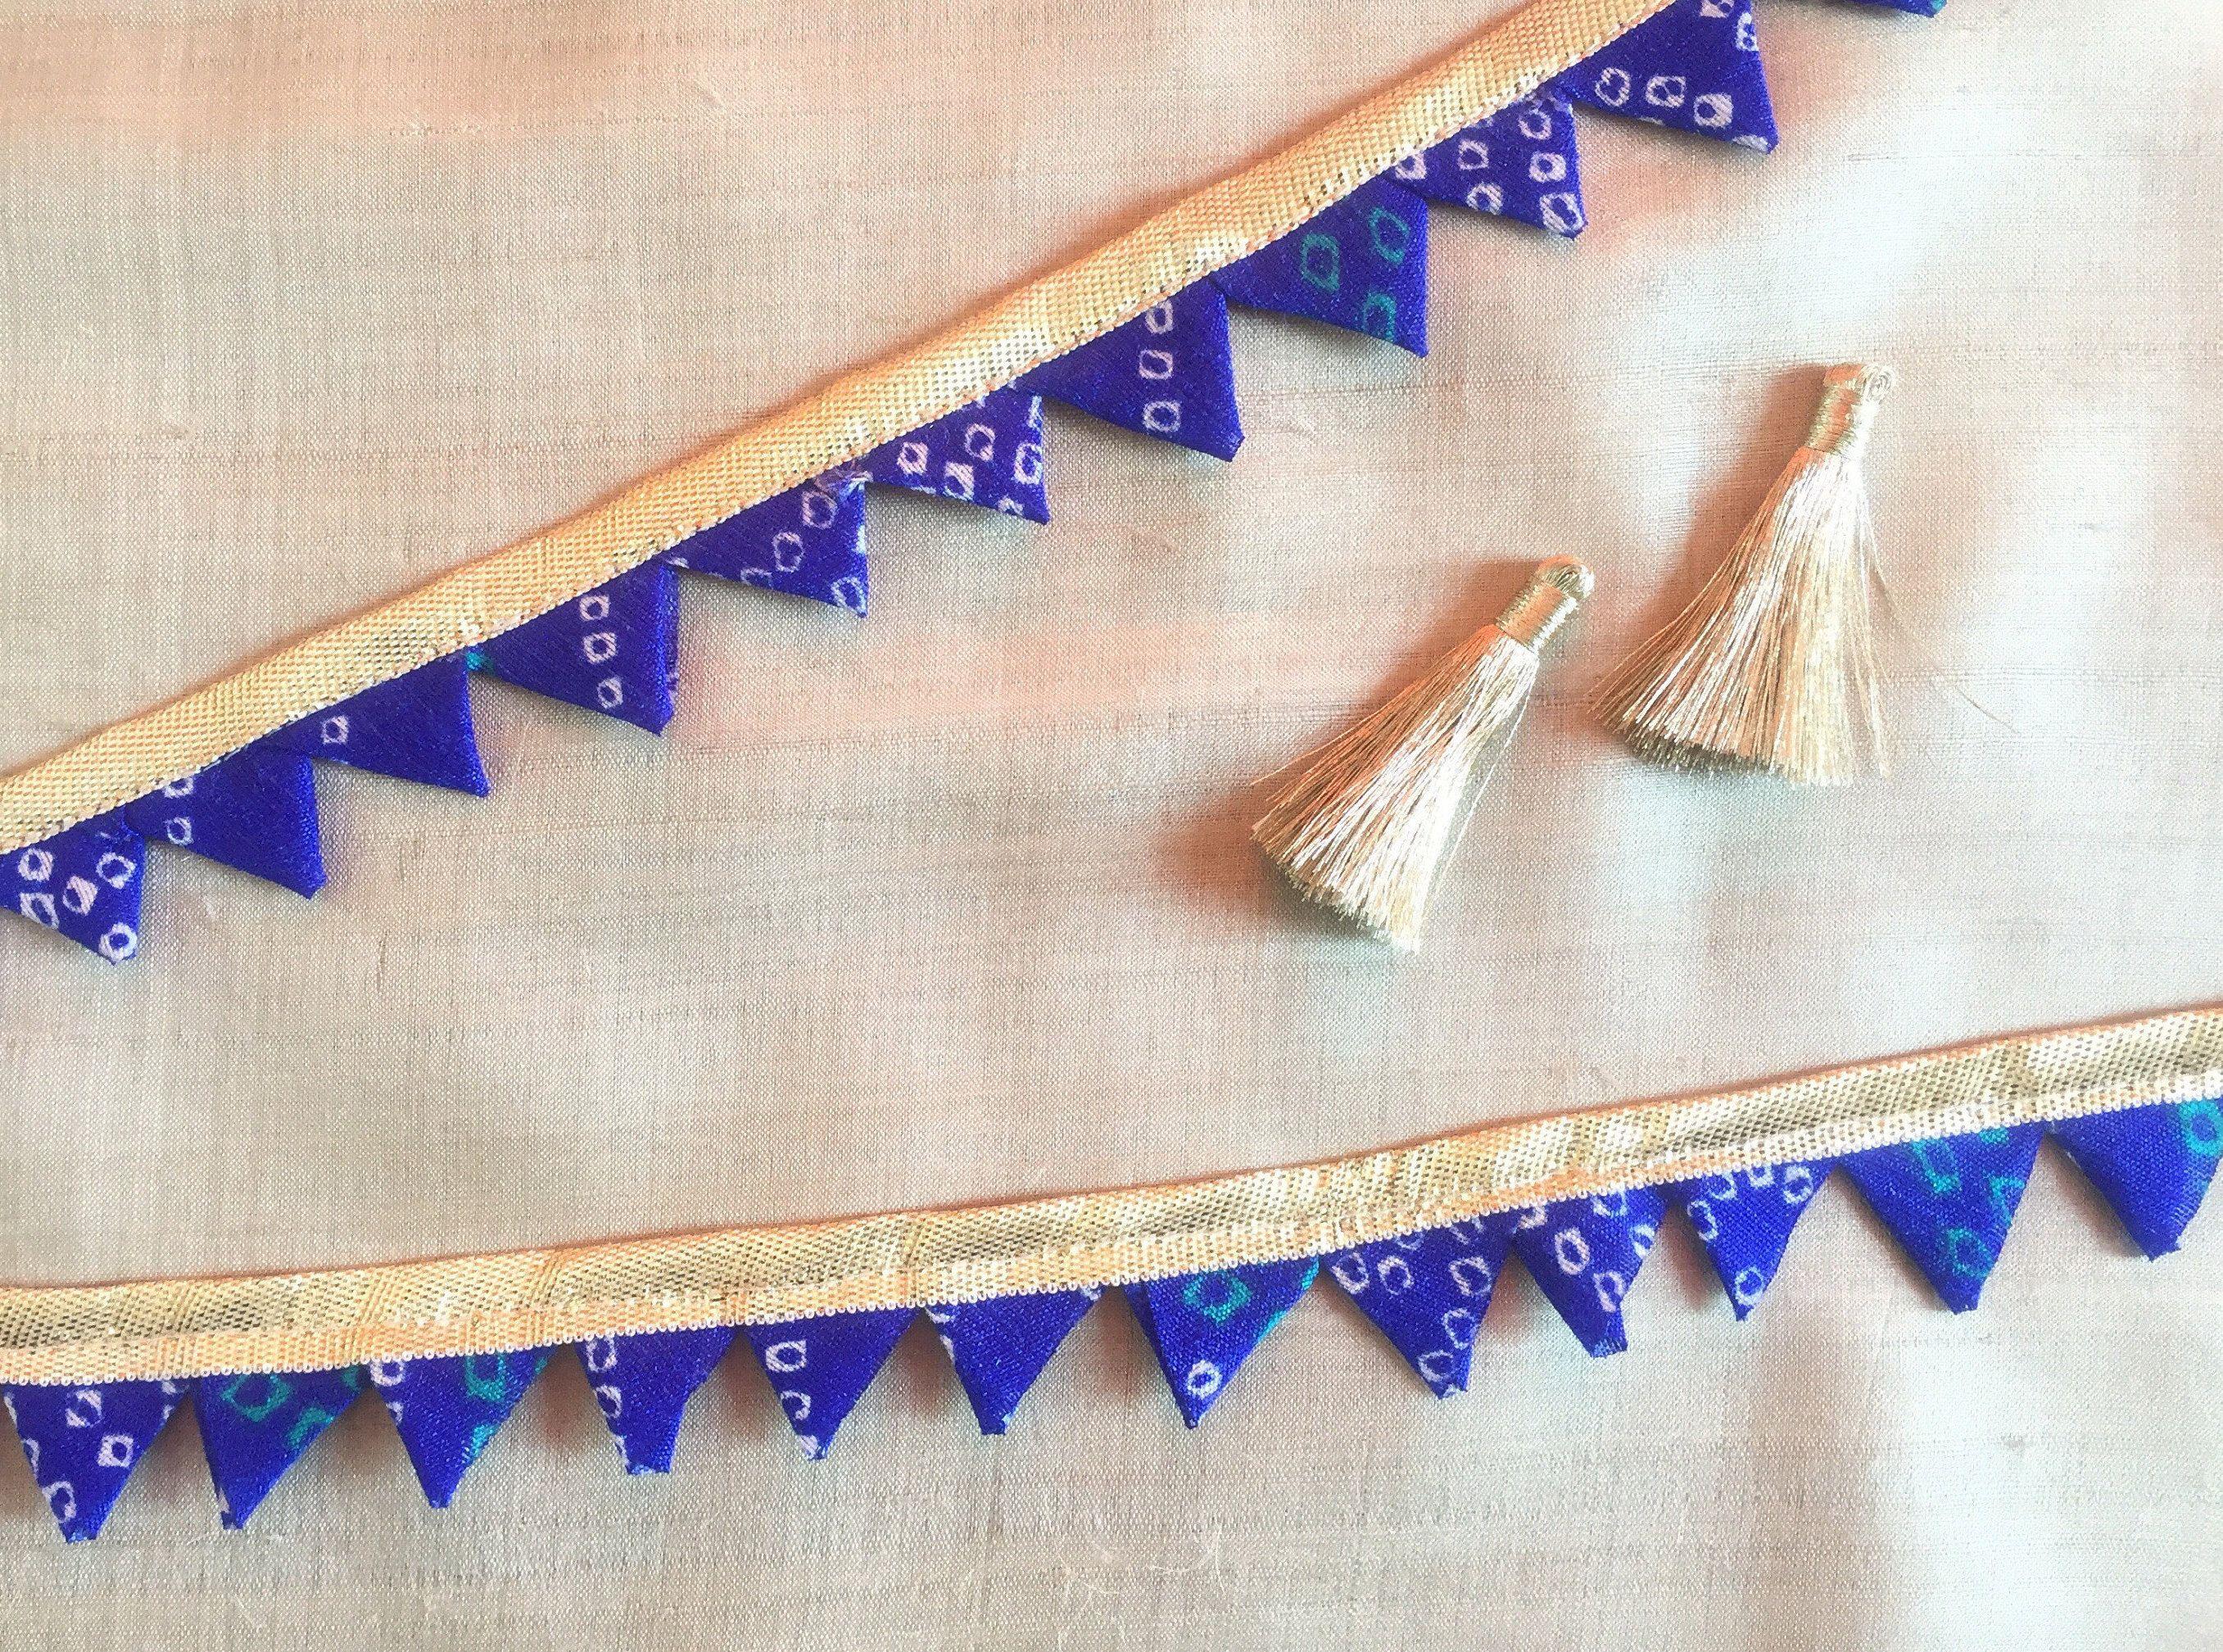 cb1f201e23fe Blue Bandhani Gota Patti Trim,Indian Resist Tie Dye Trim,Triangle ...